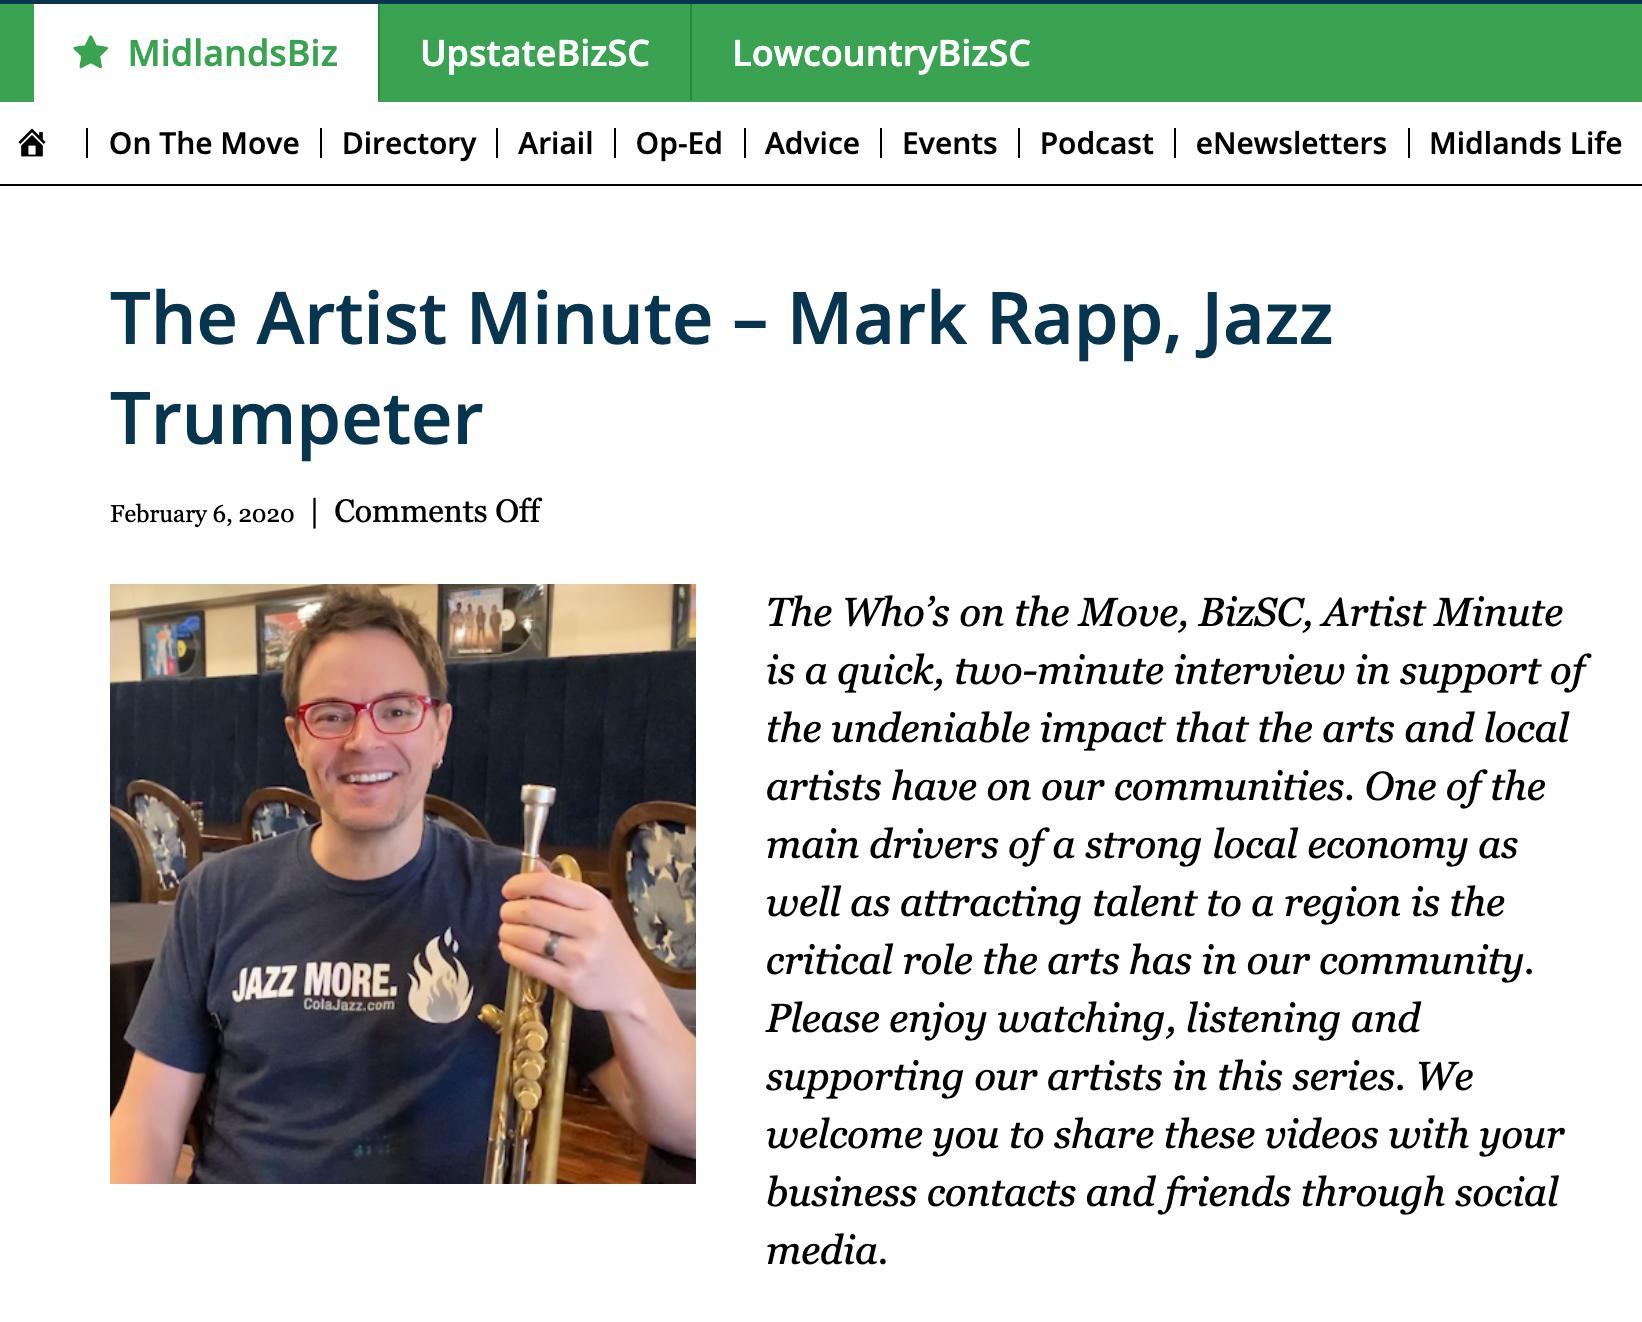 The Artist Minute – Mark Rapp, Jazz Trumpeter